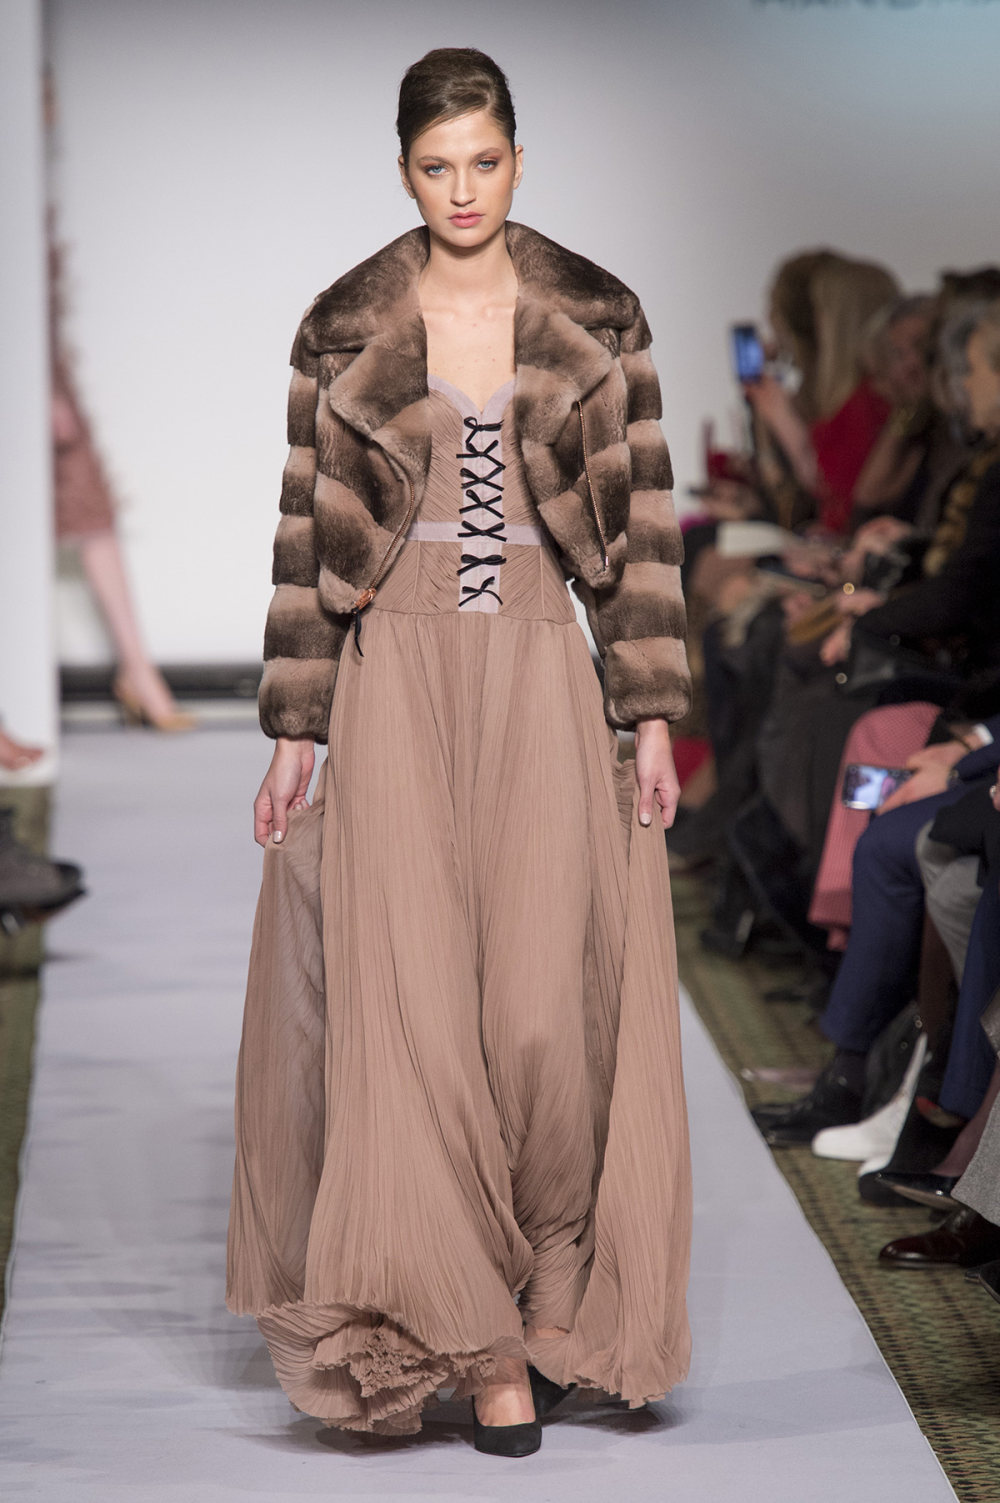 Carolina Herrera时装系列用鲜艳的颜色充满智能的黑白色调-45.jpg